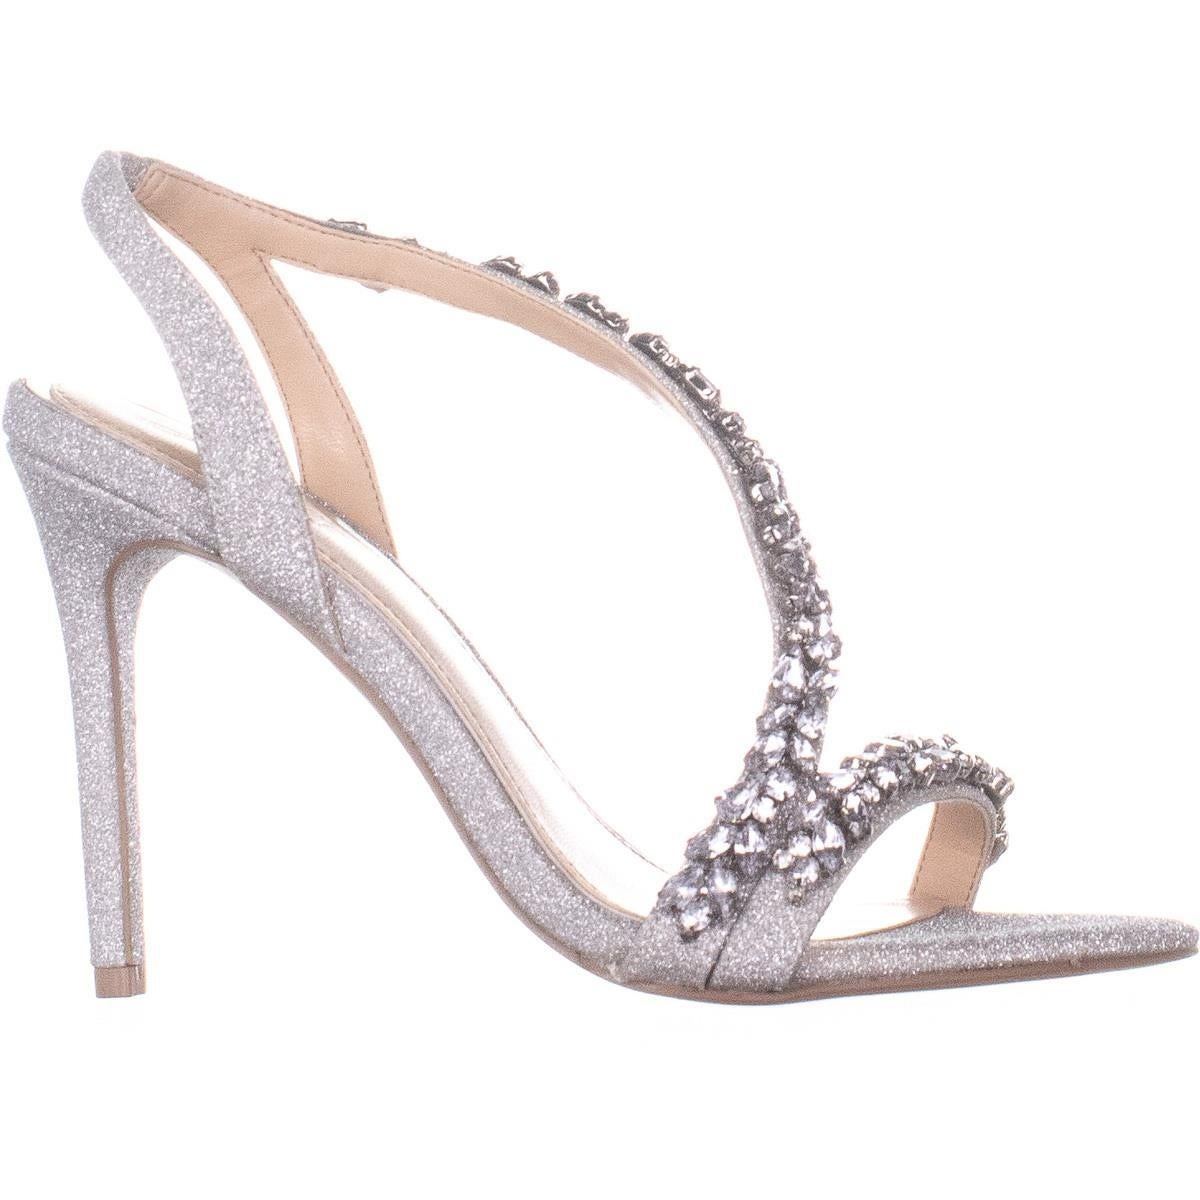 3be279096a7 Shop Jewel Badgley Mischka Java Heeled Sandals